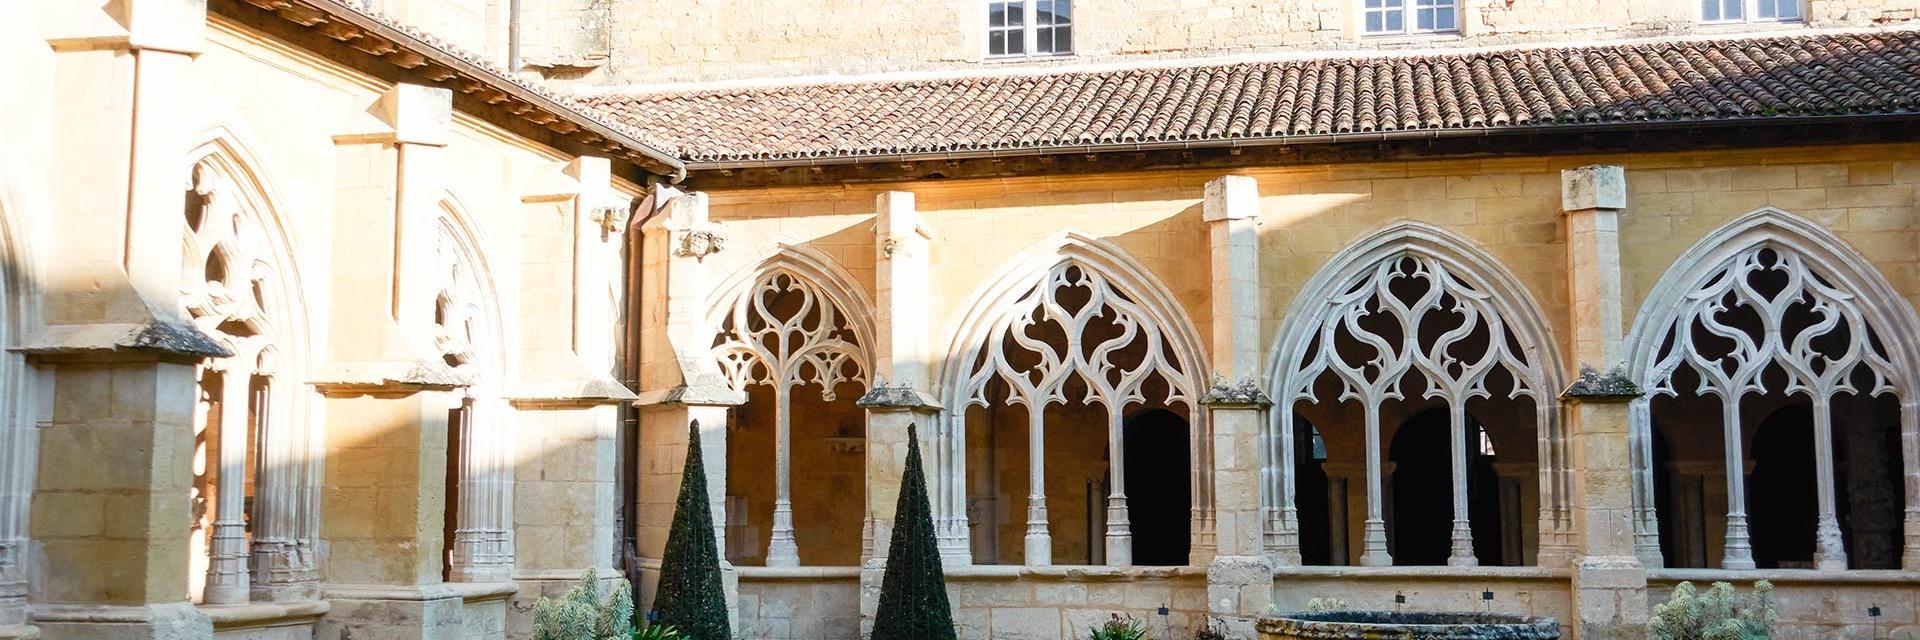 Cloître de Cadouin